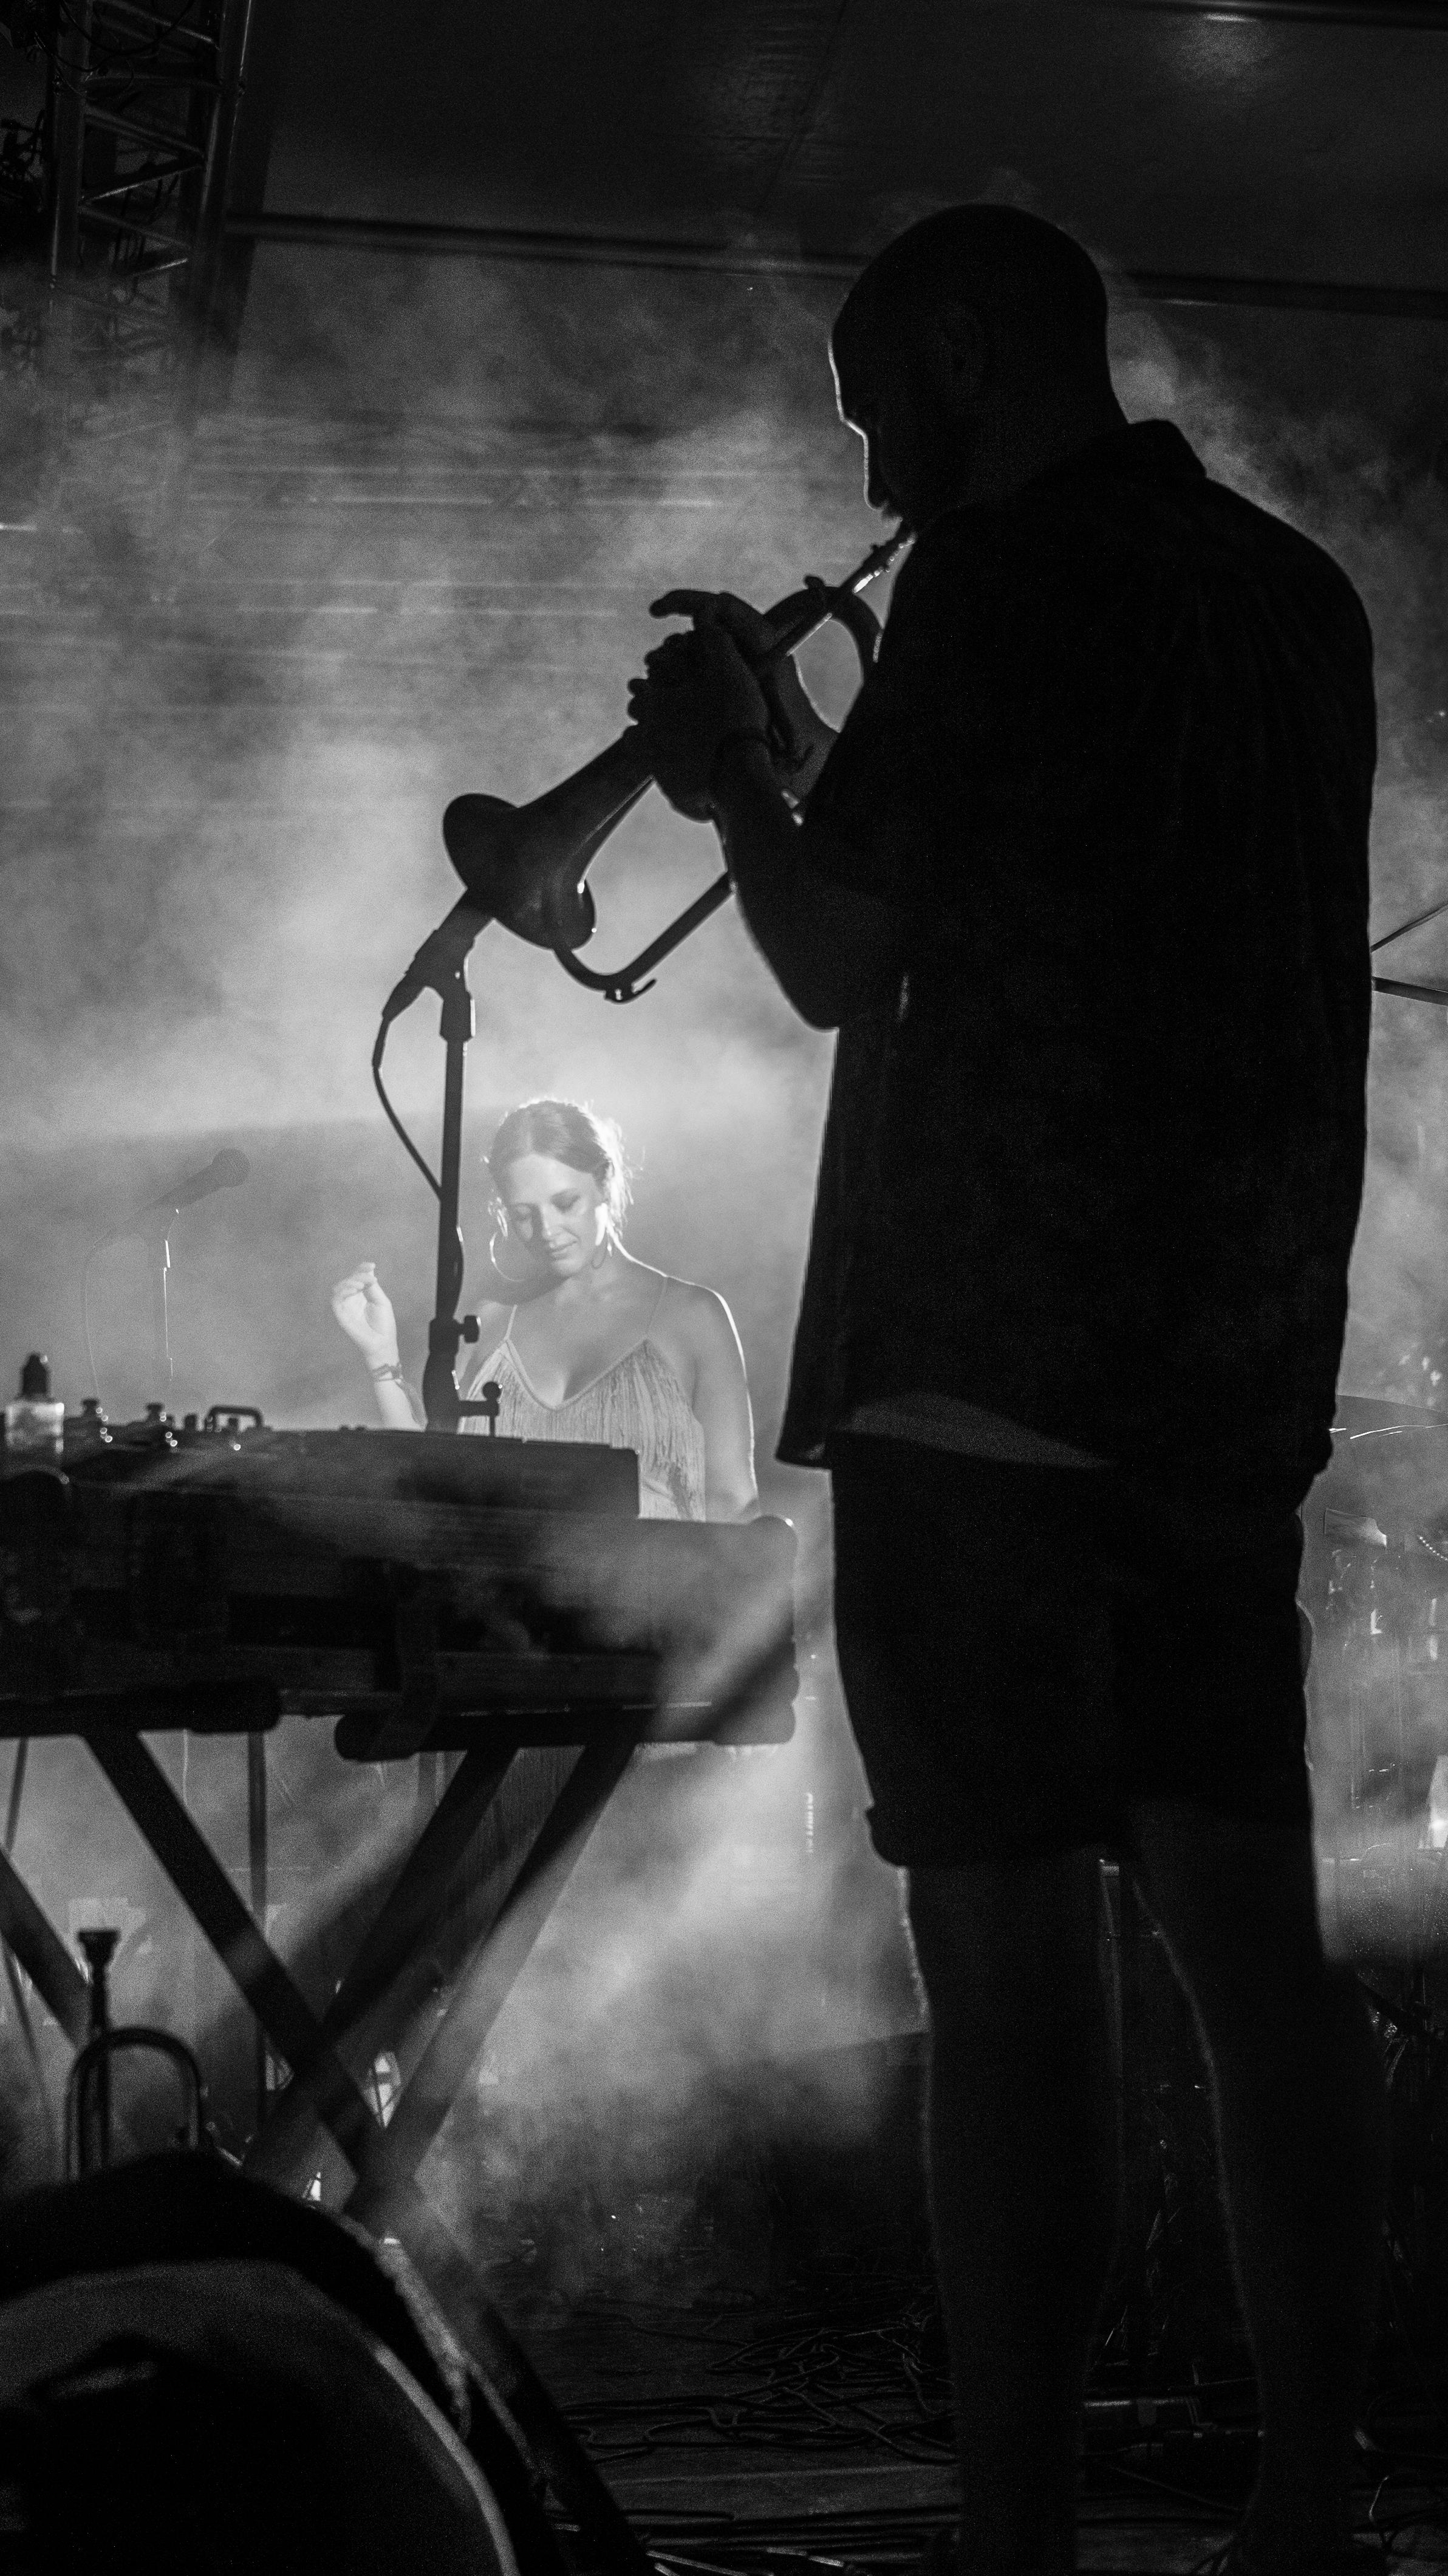 Submotion Orchestra at Soundwave Festival 2018